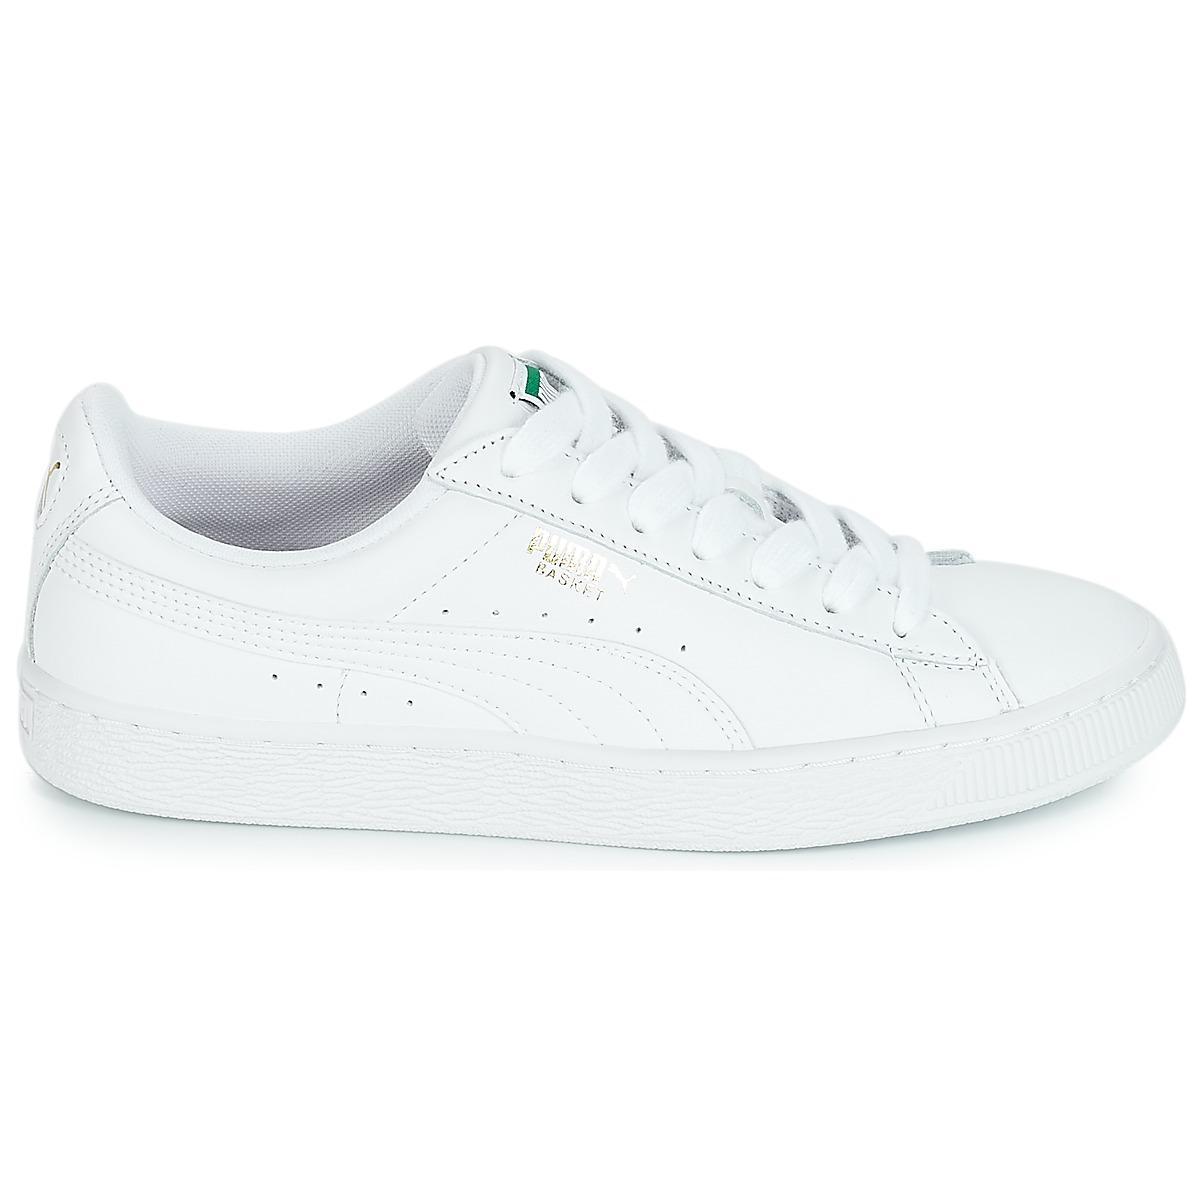 7226da99e0b2 PUMA - White Basket Classic Lfs.wht Shoes (trainers) - Lyst. View fullscreen